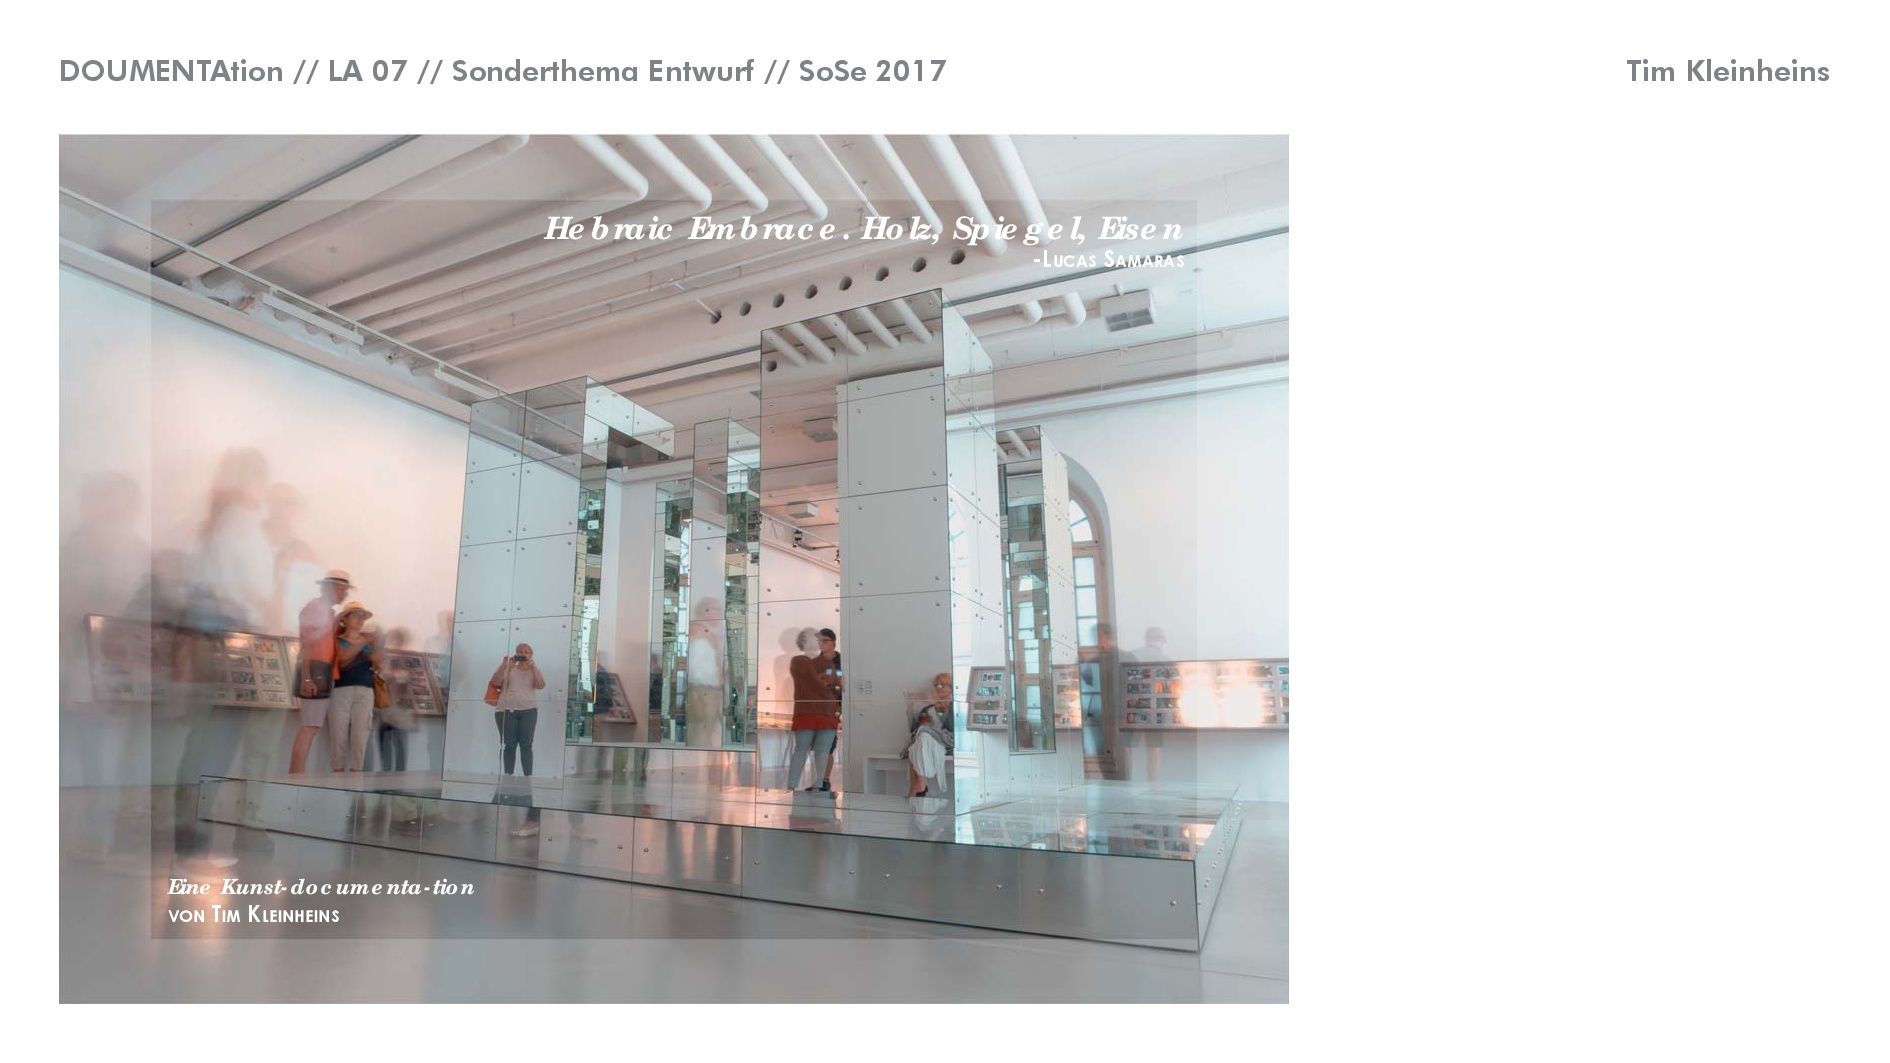 NEU Sonderthema Entwerfen SoSe 17 004